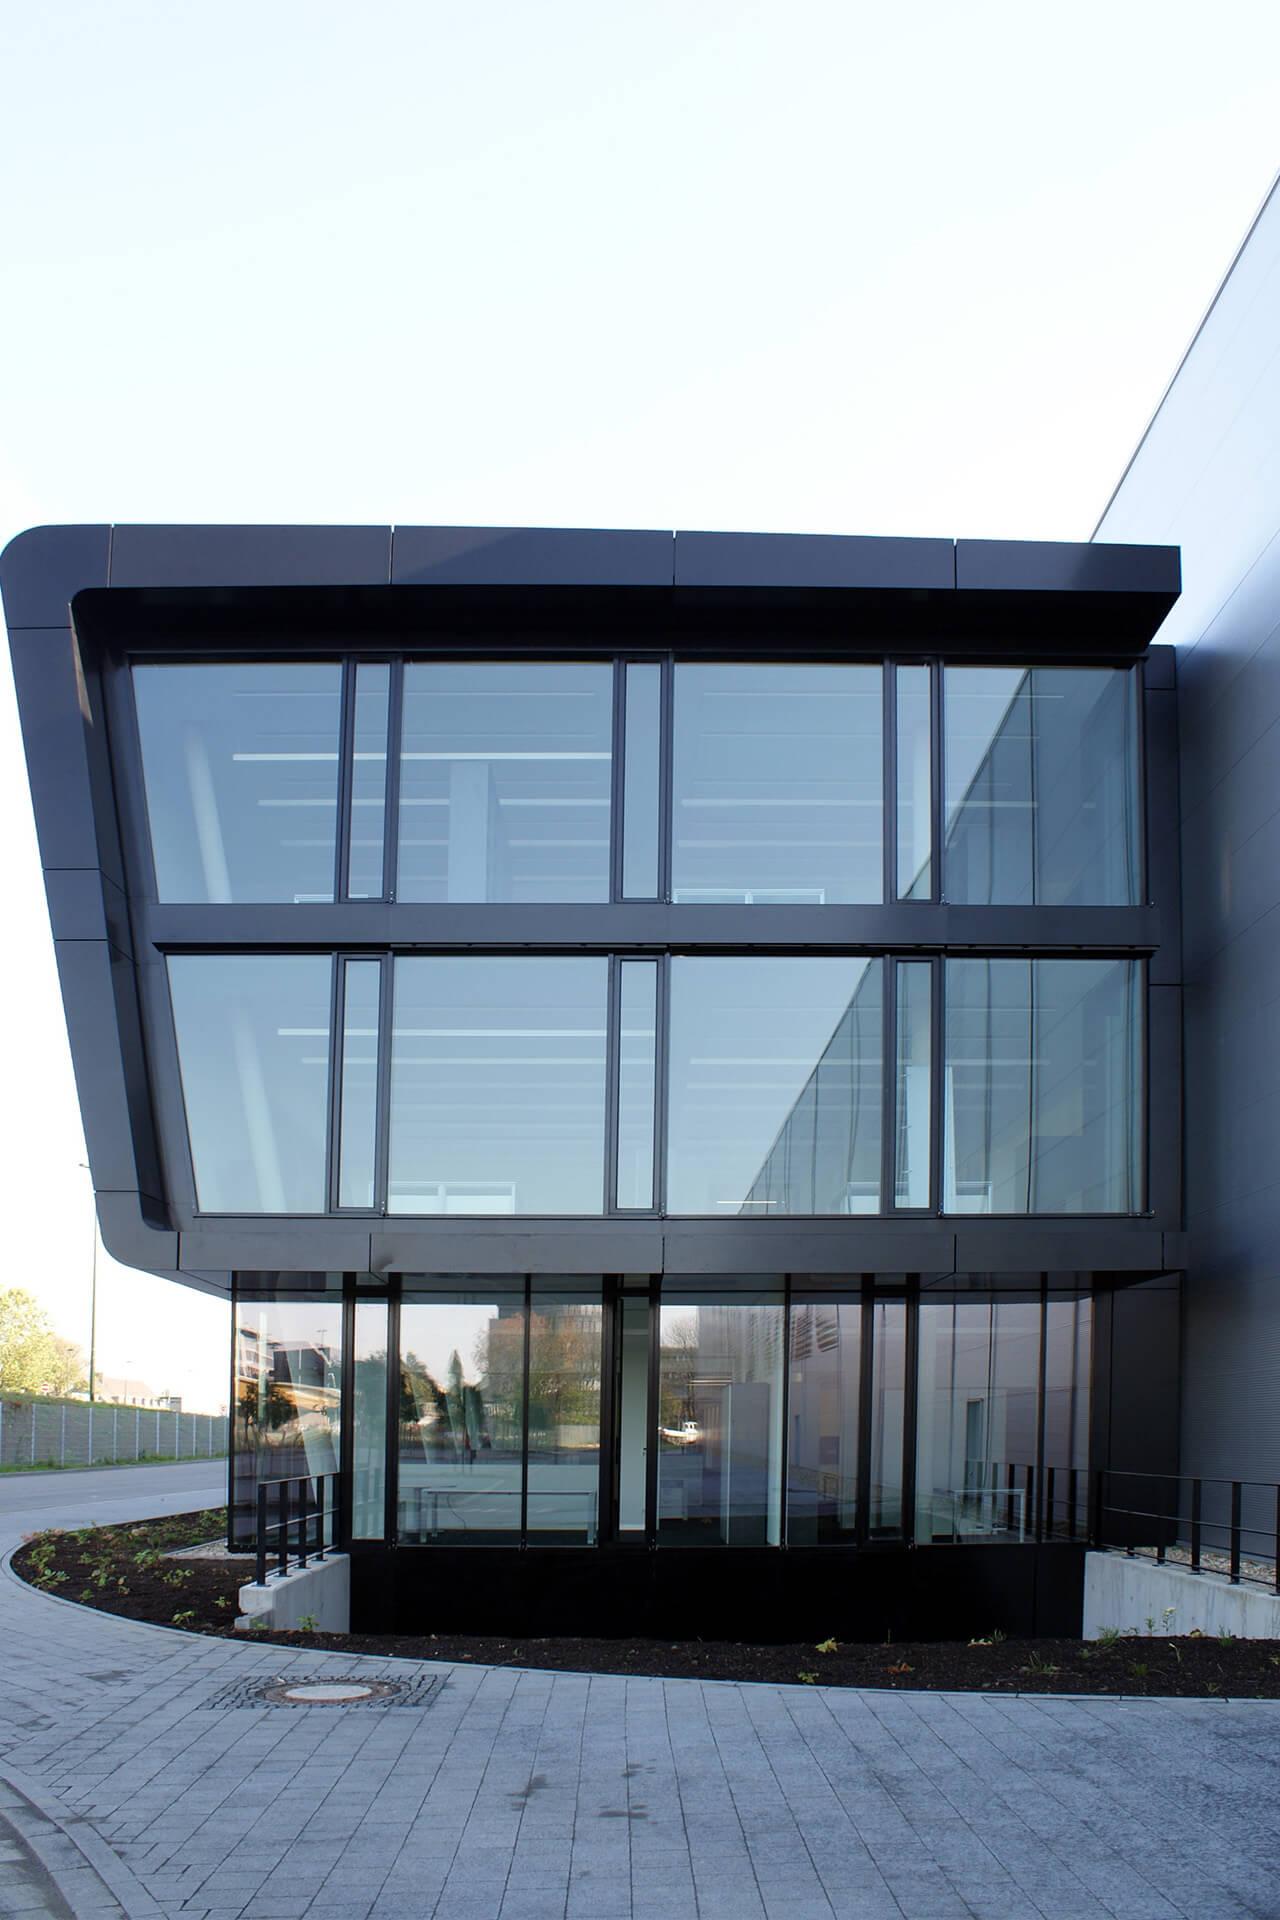 Darmstadt, Hessenmetall, Schulungs-u. Seminargebäude